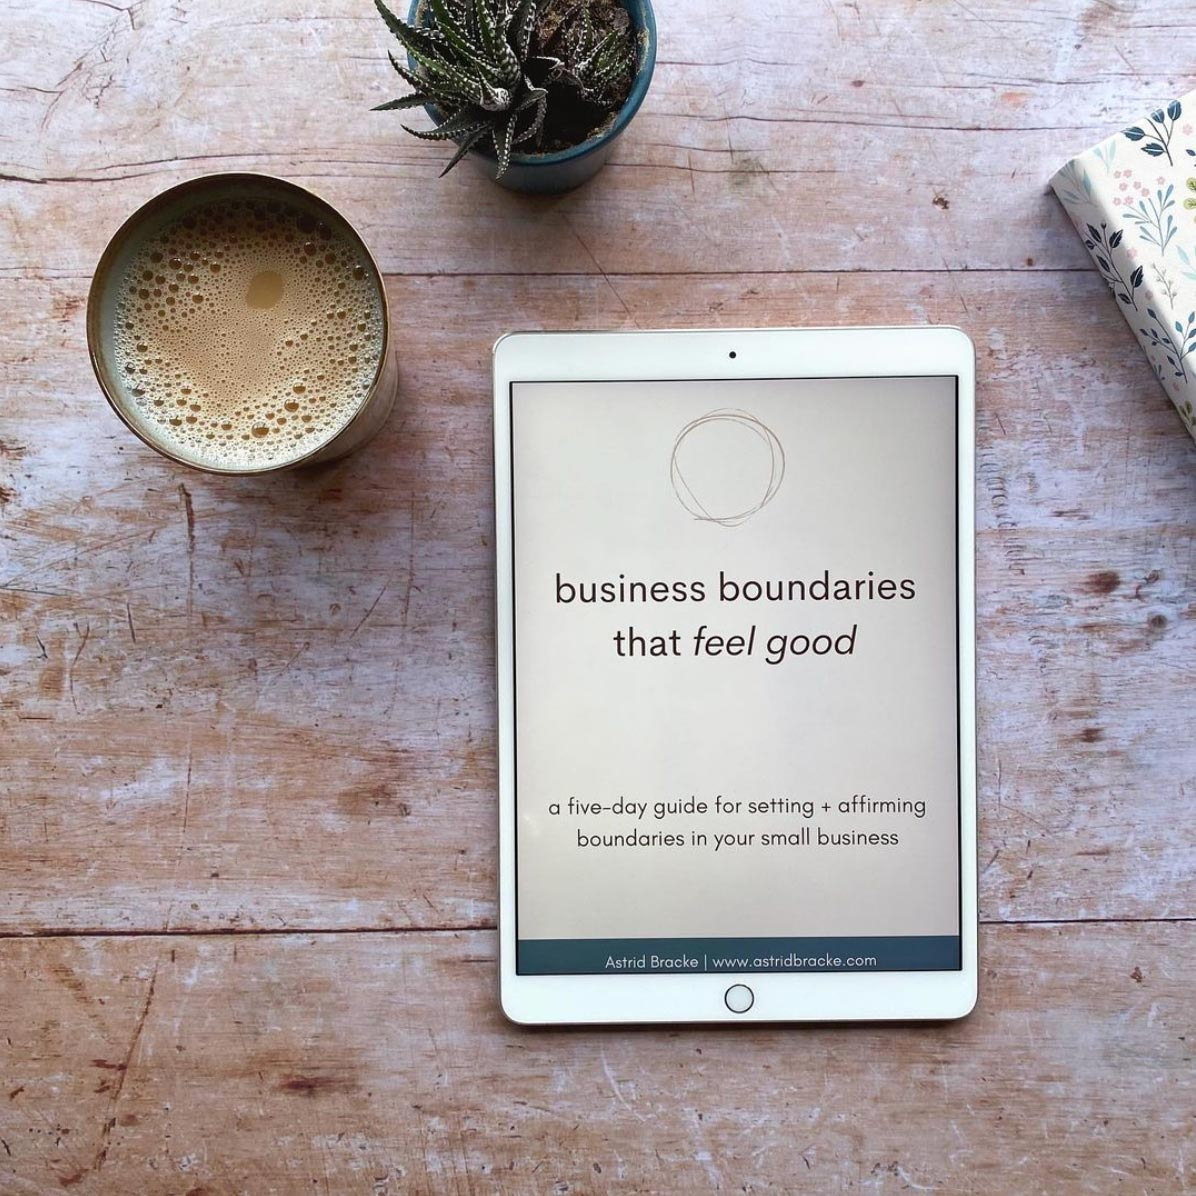 3 Strategies To Set Business Boundaries That Feel Good